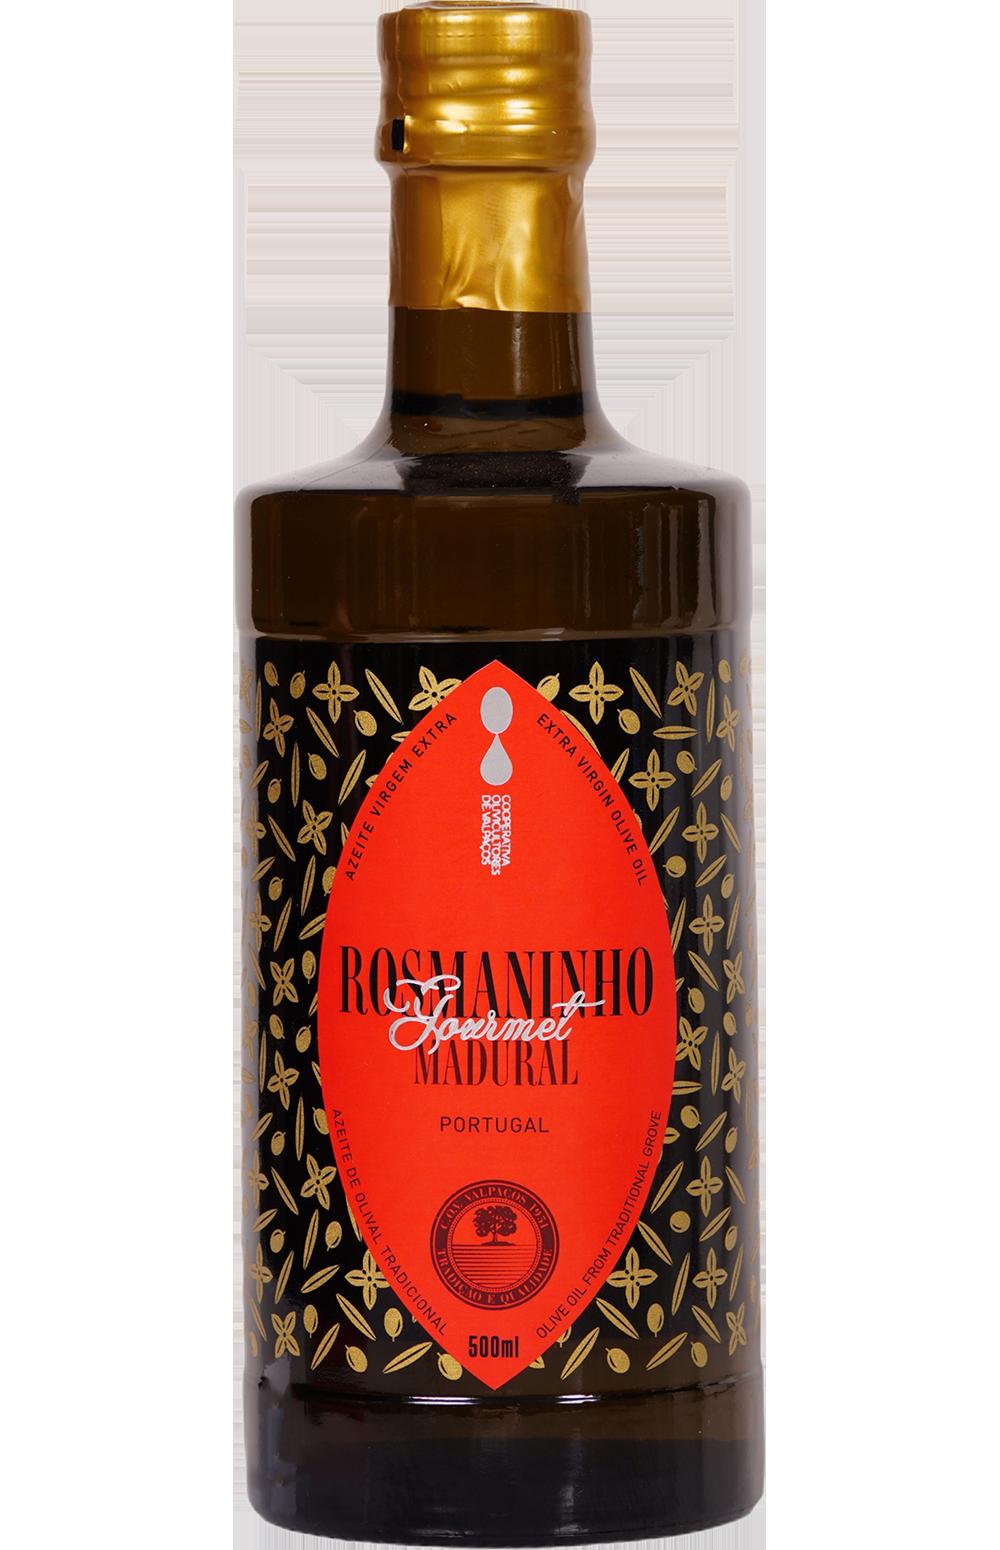 Rosmaninho Gourmet Madural